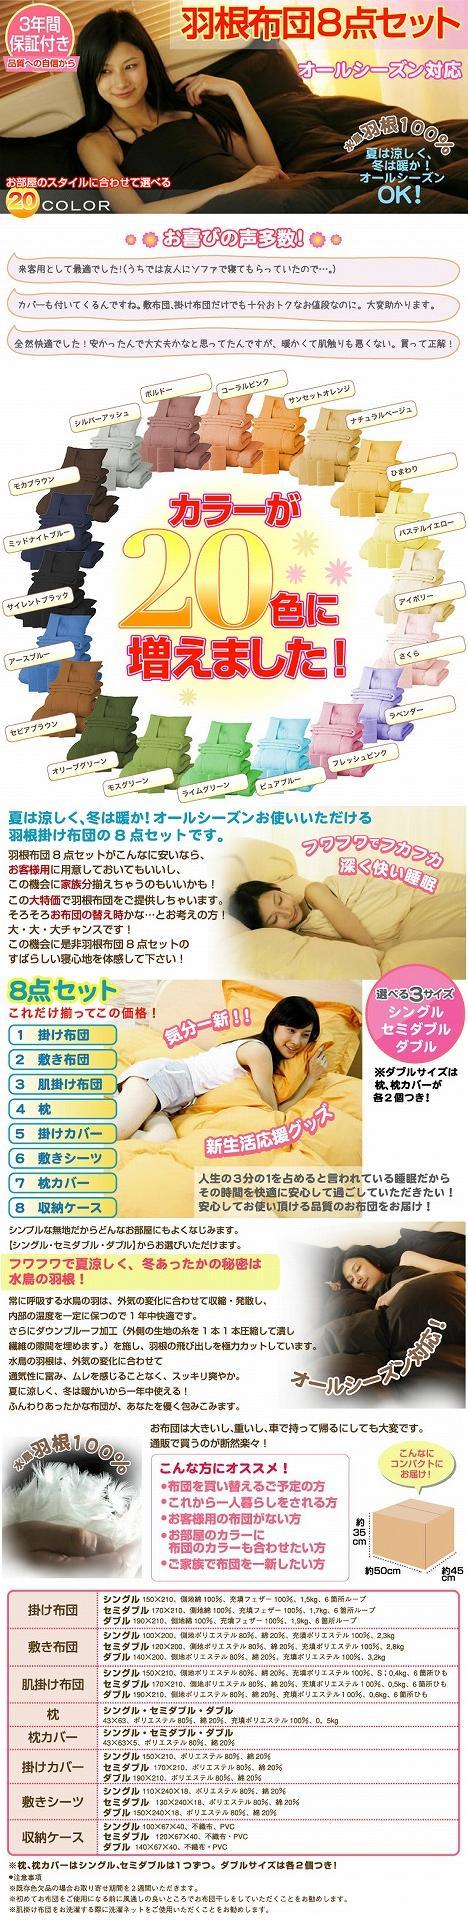 futon1_20色